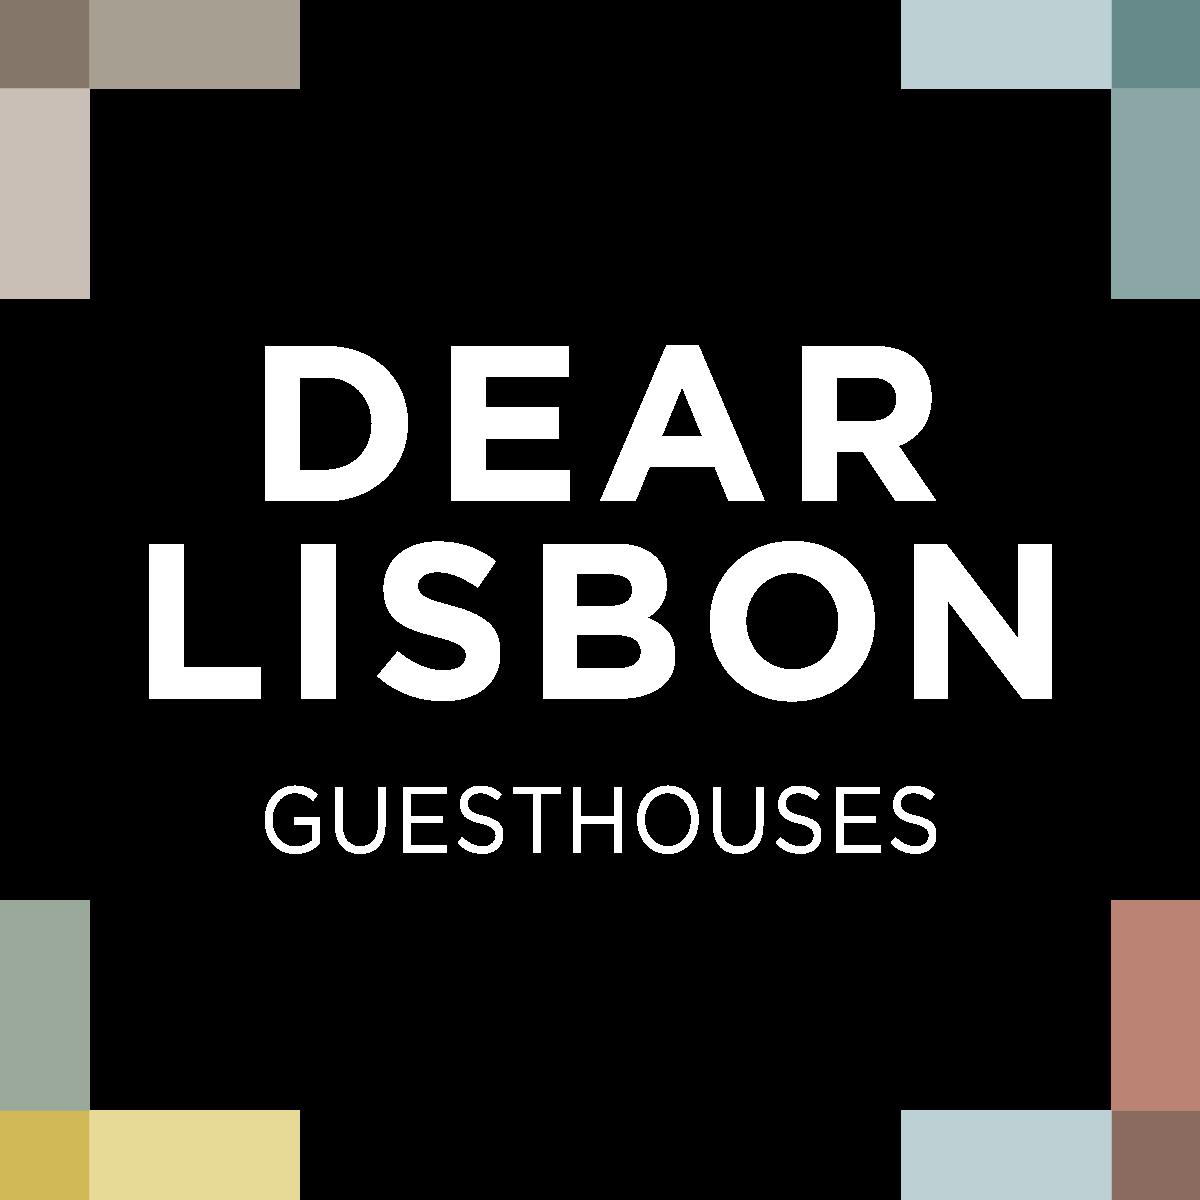 Dear Lisbon